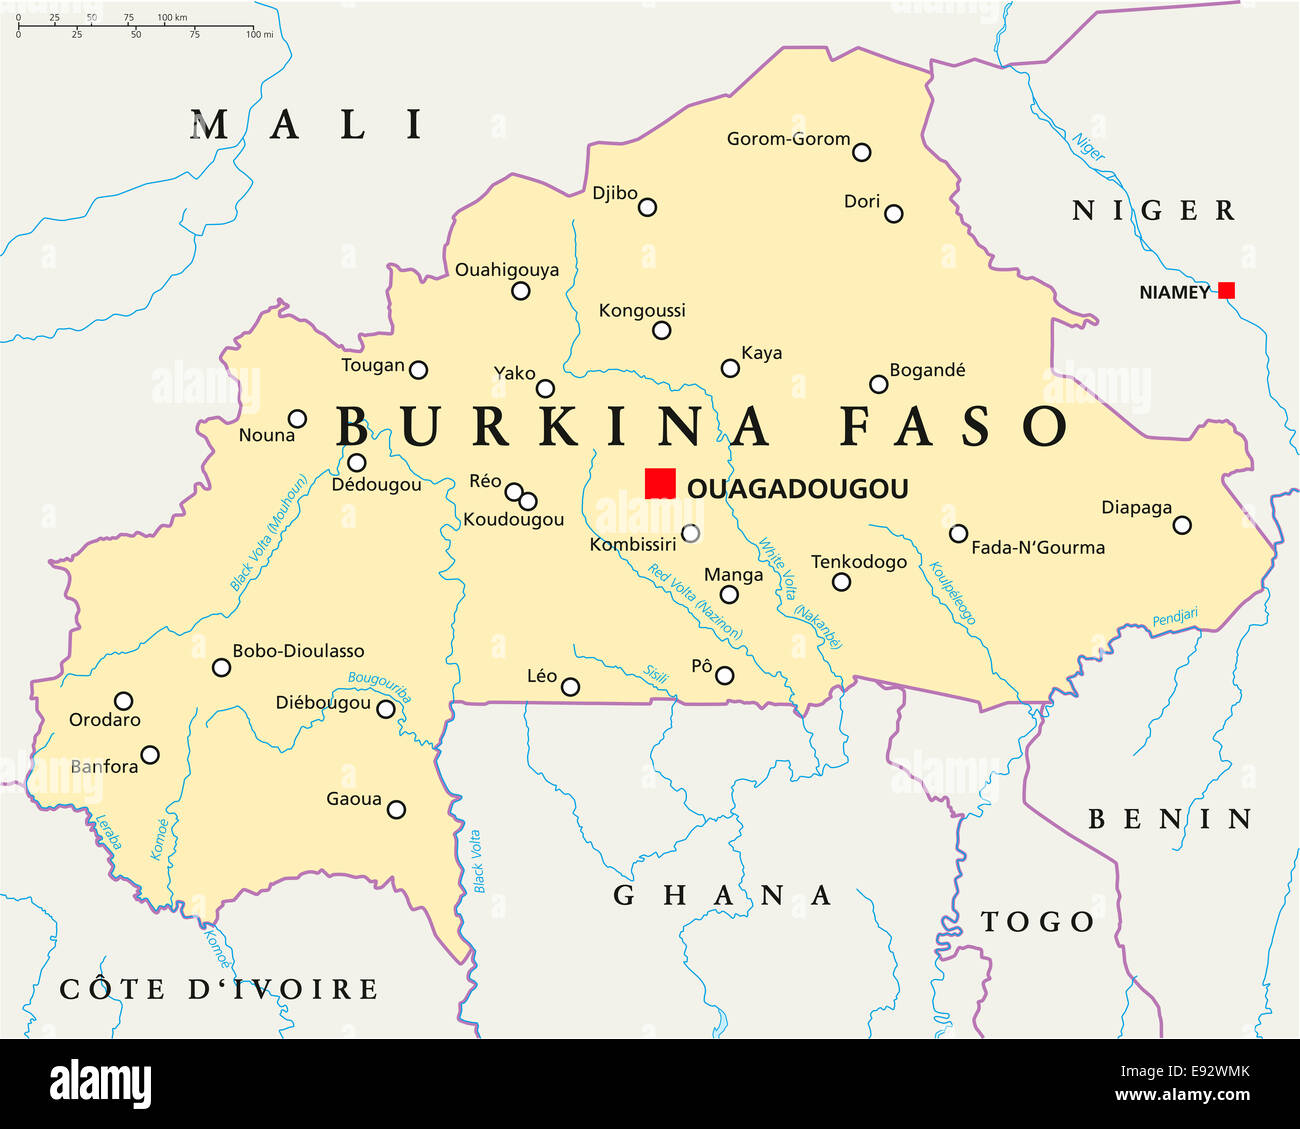 Burkina Faso Political Map With Capital Ouagadougou